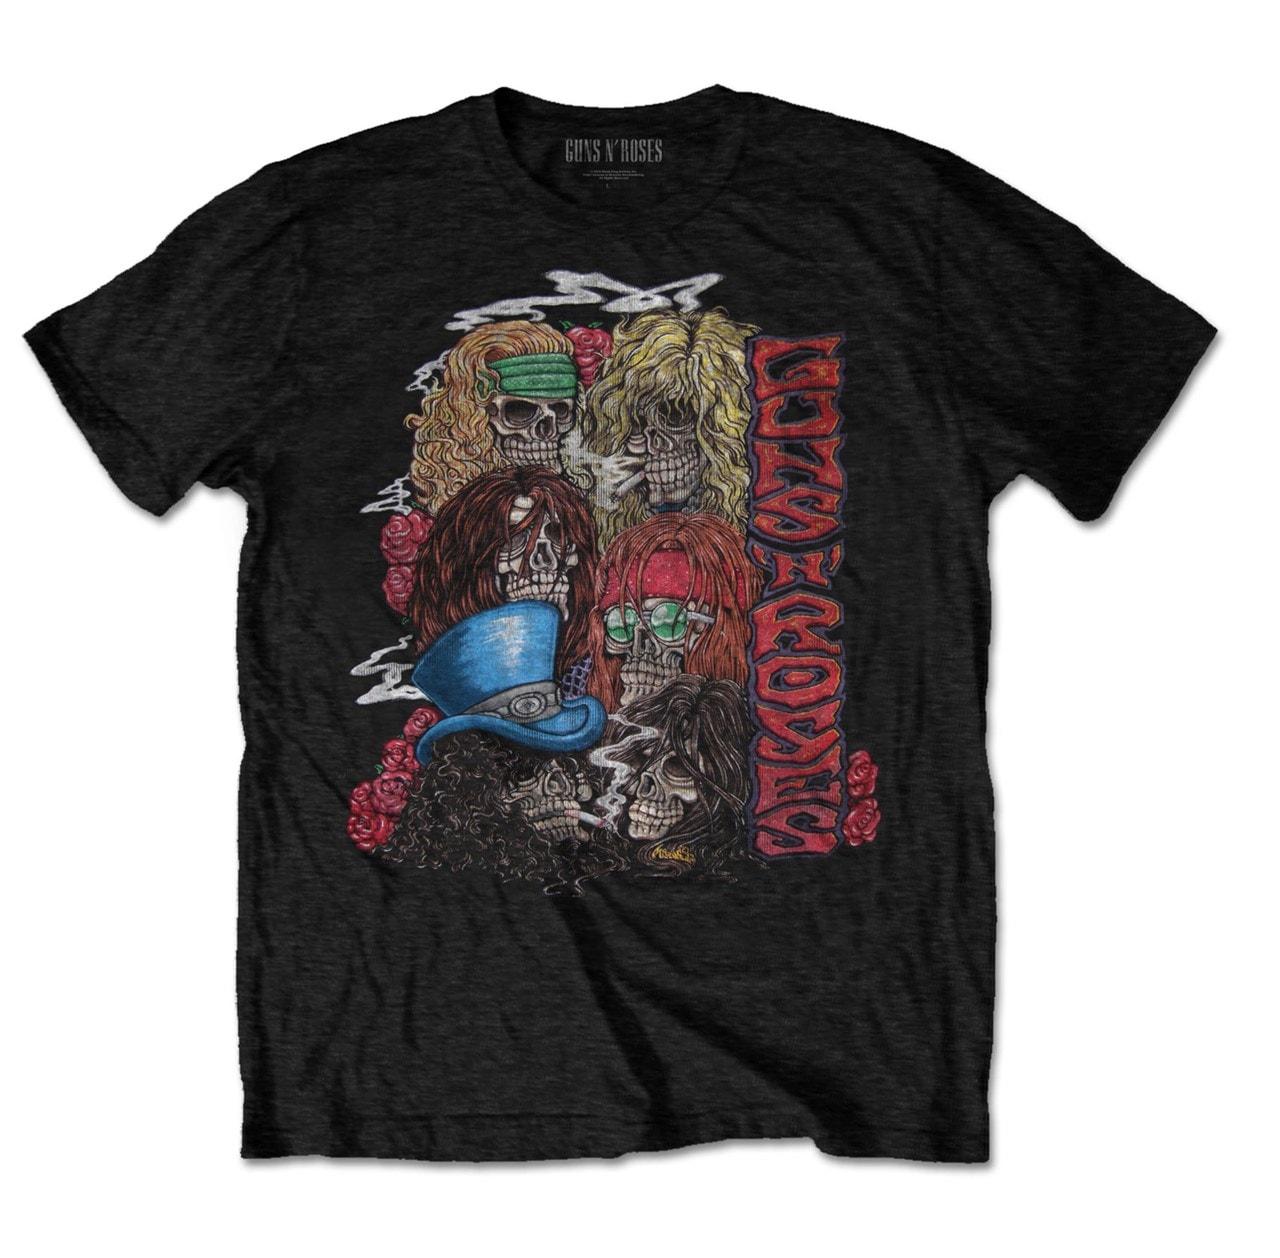 Guns N Roses: Stacked Skulls (hmv Exclusive) (Small) - 1